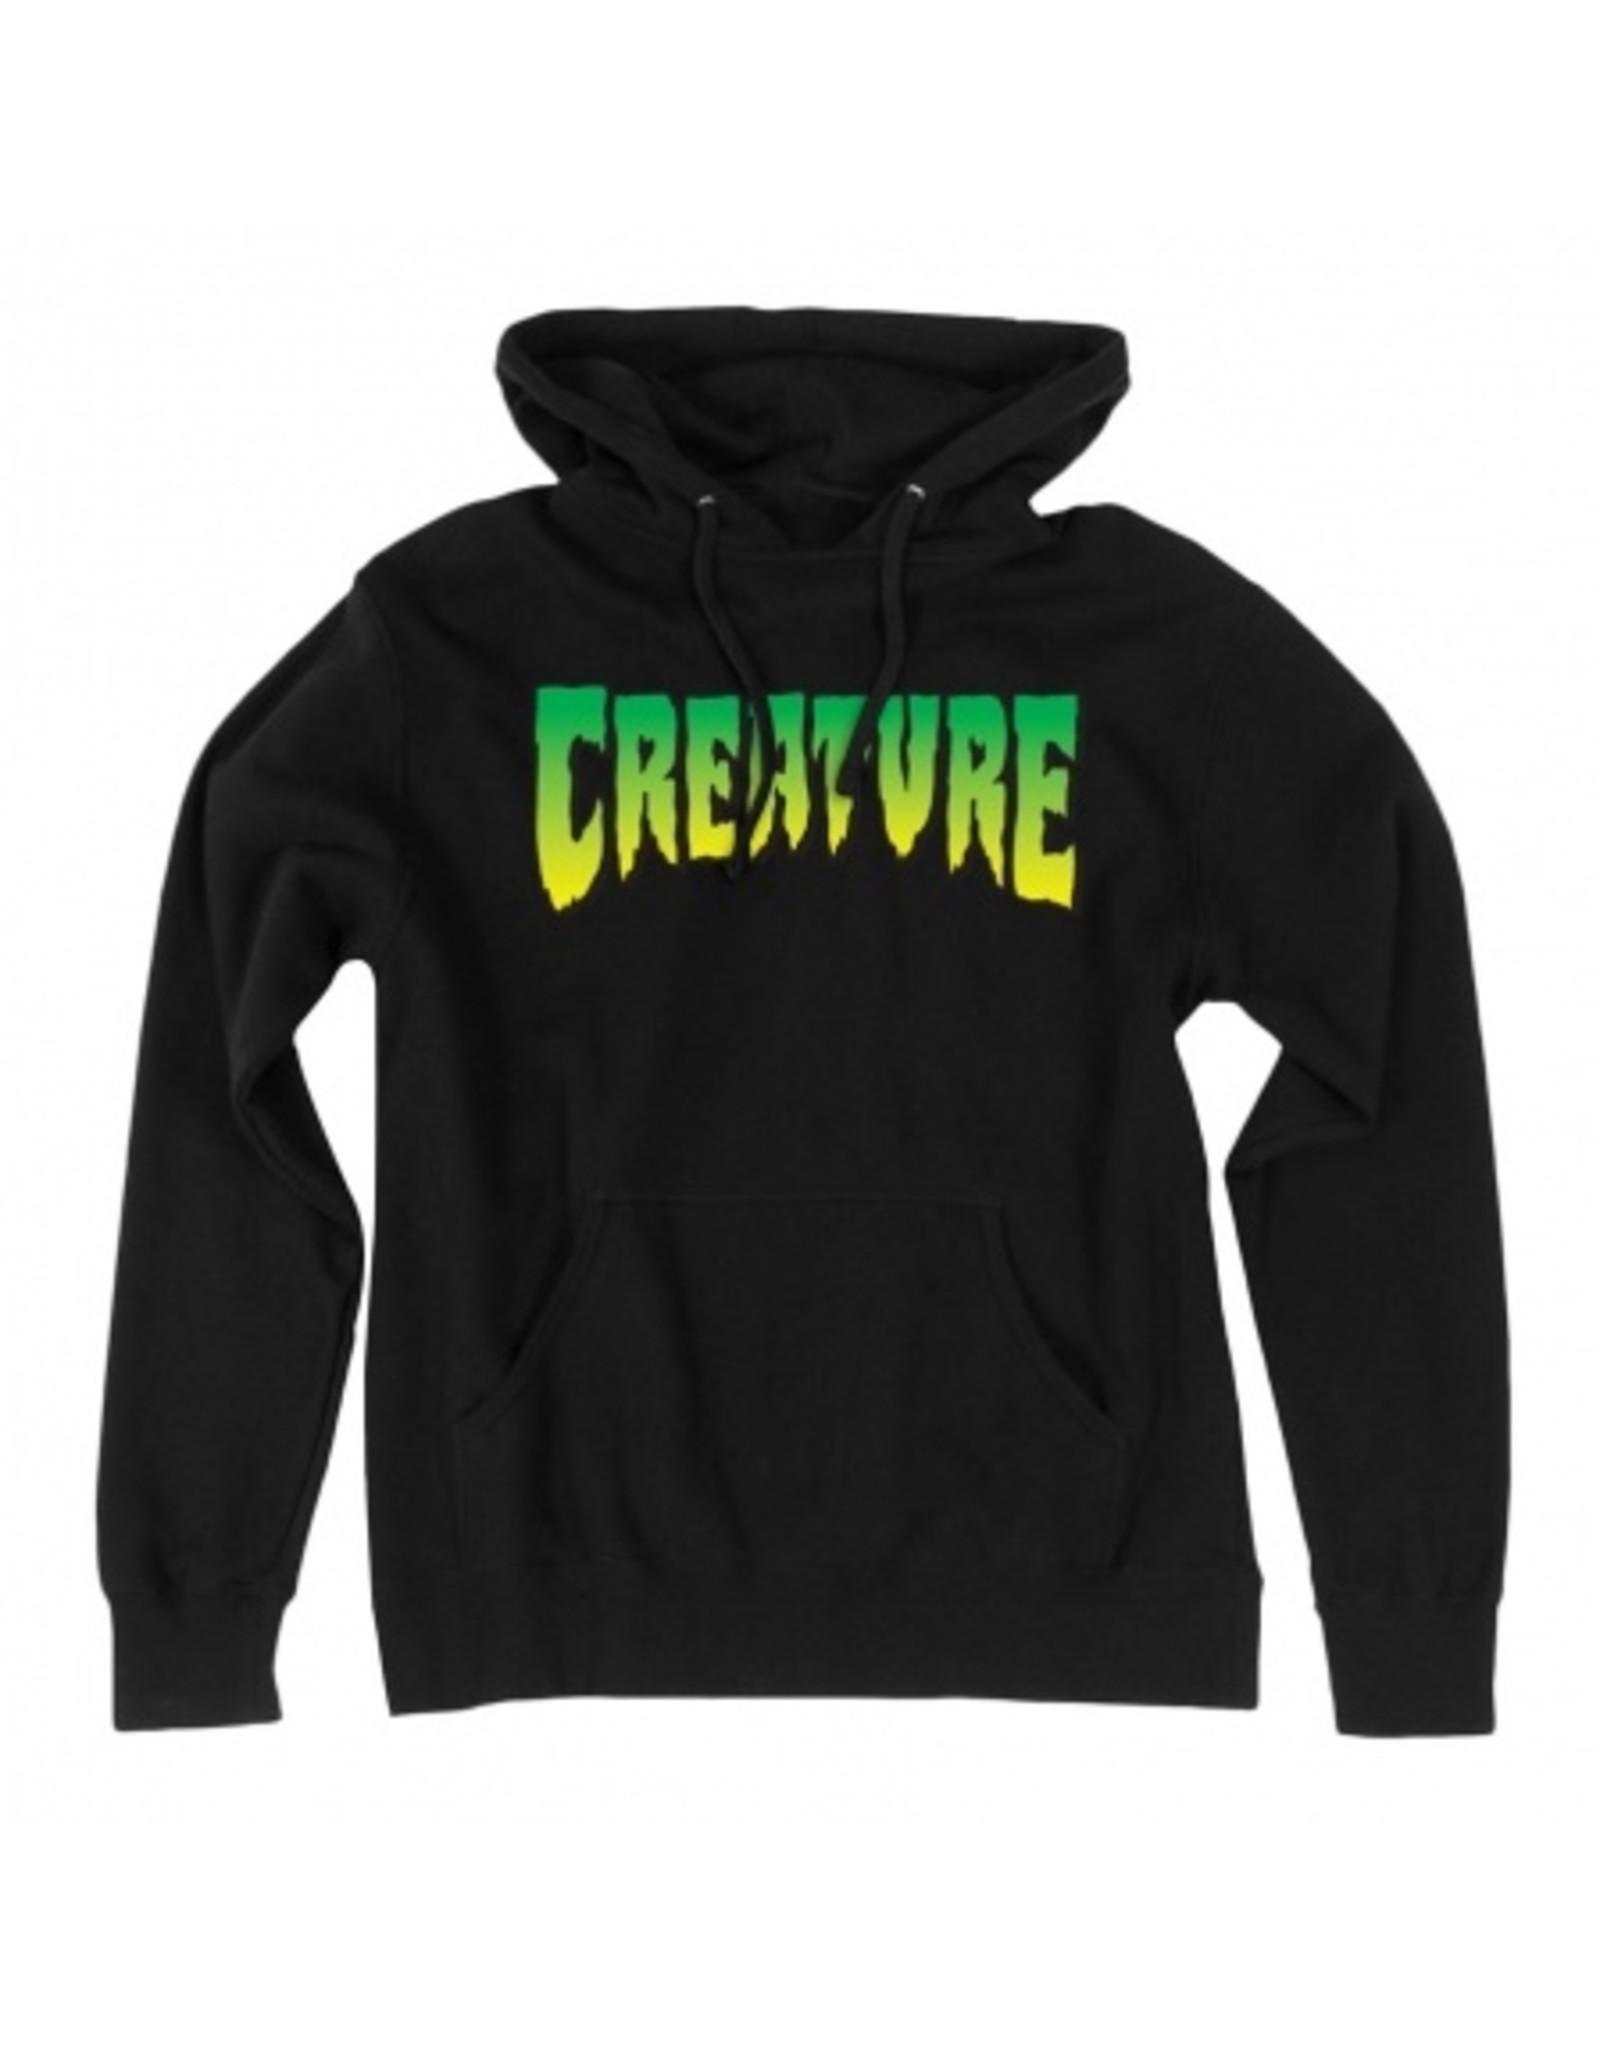 CREATURE CREATURE - LOGO HOODY BLACK